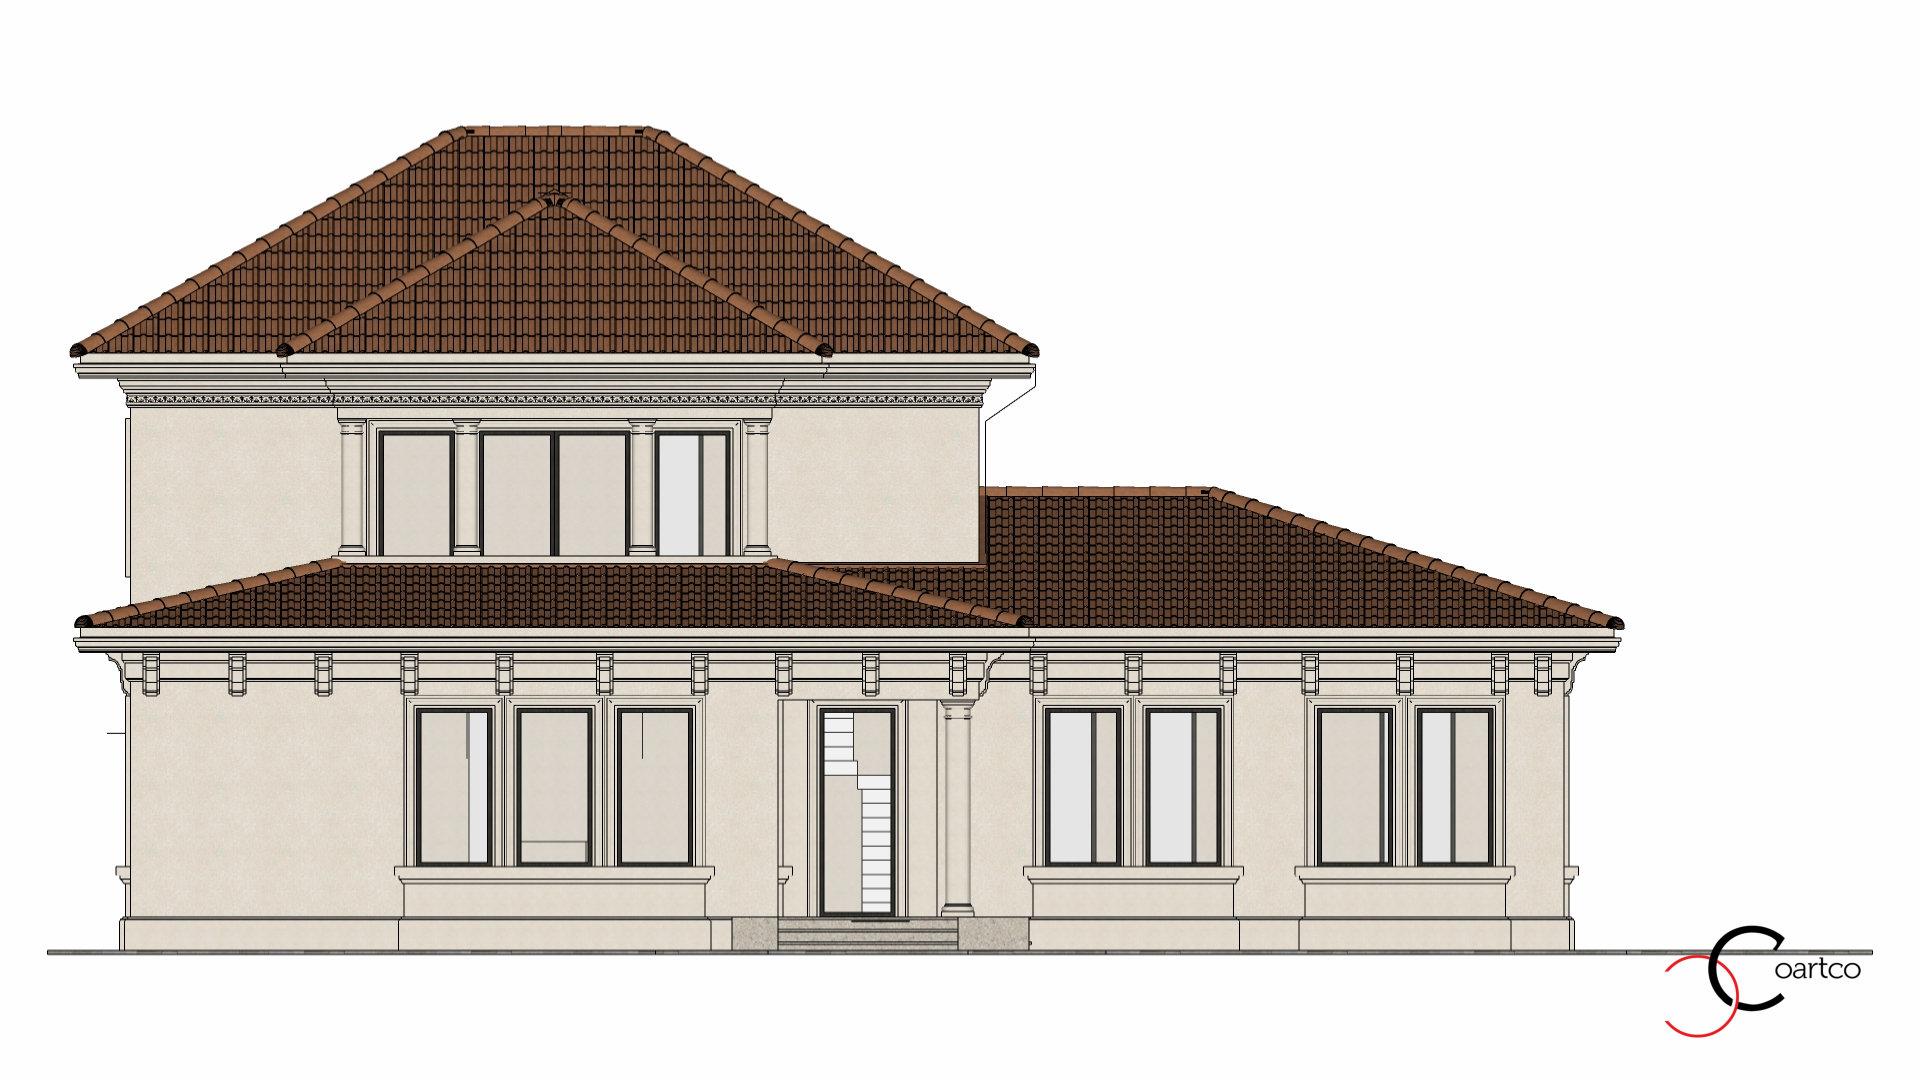 proiect-ornamente-exterior